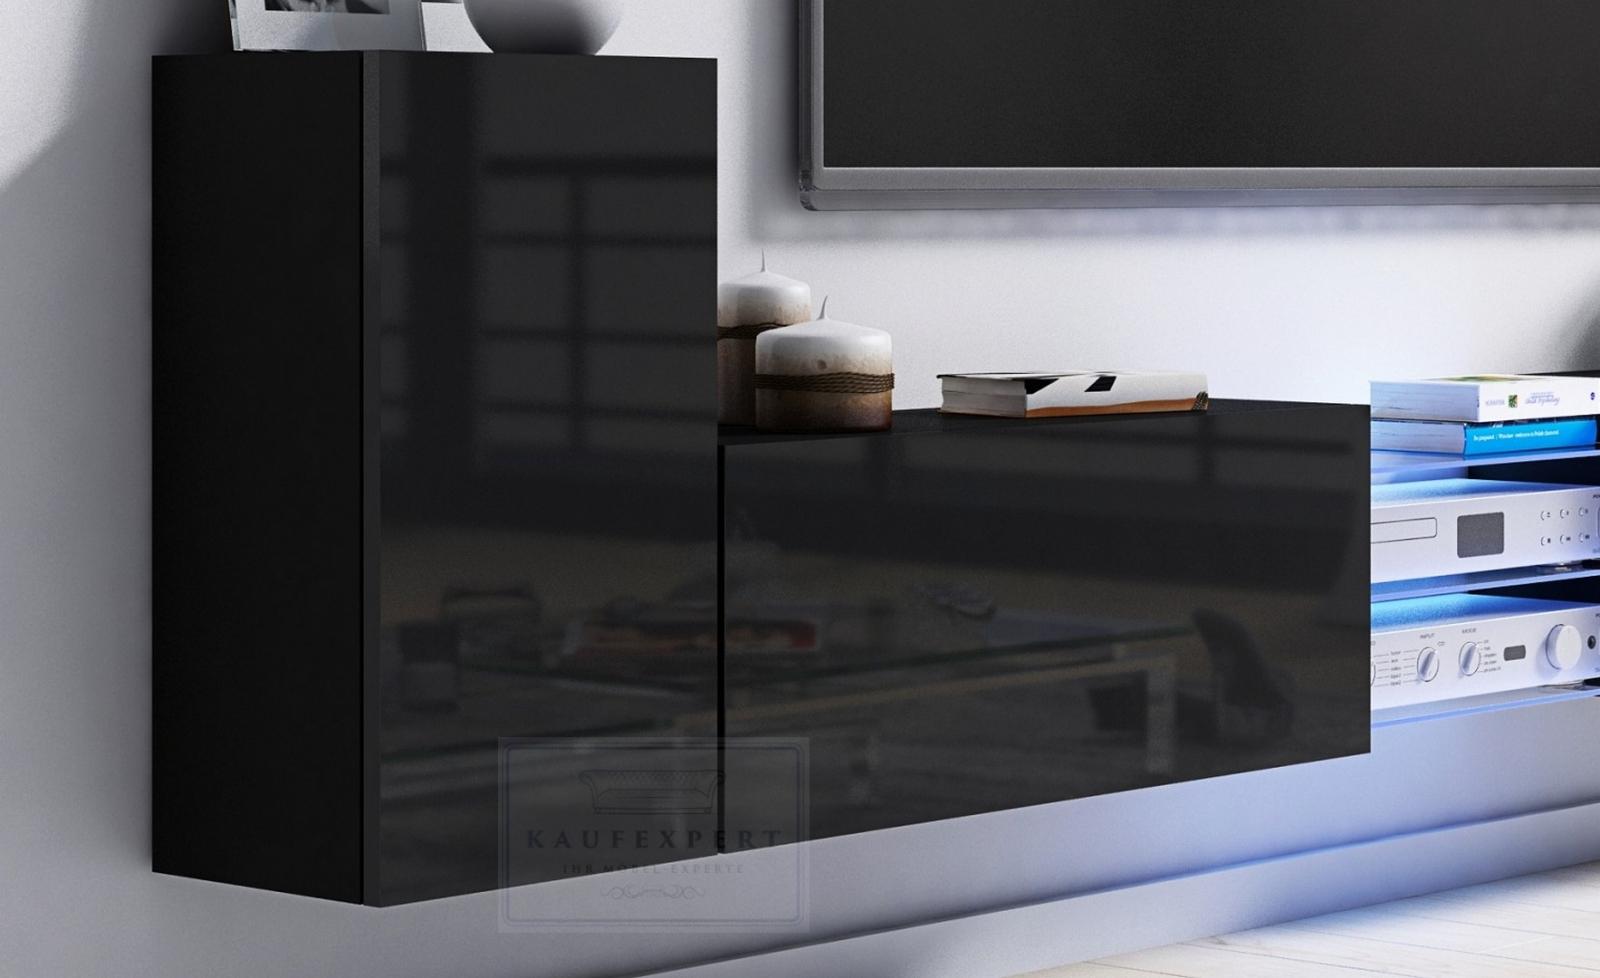 kaufexpert tv lowboard galaxy wei hochglanz sonoma mdf design board hifi tisch beleuchtung. Black Bedroom Furniture Sets. Home Design Ideas